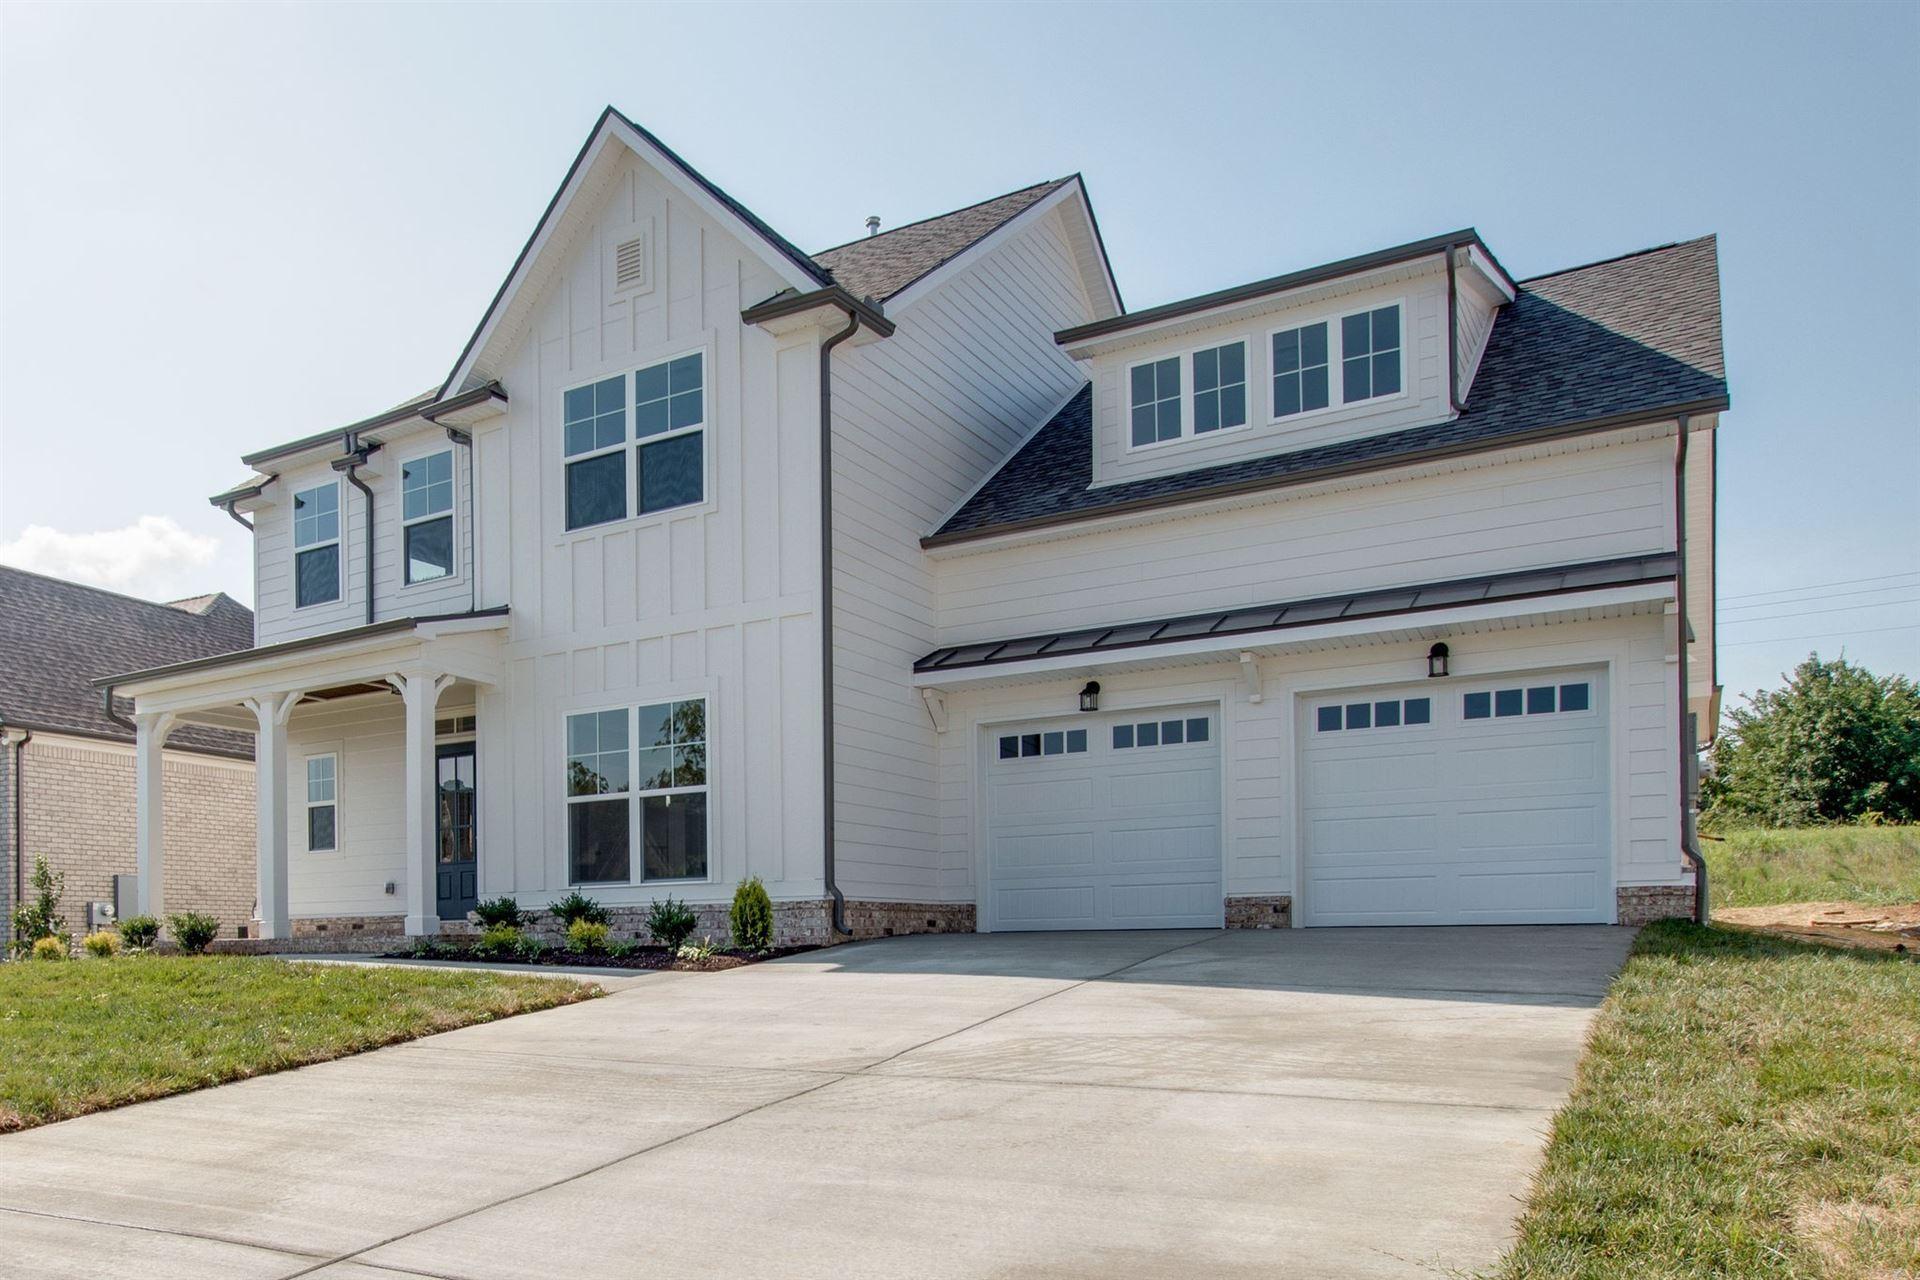 Photo of 1309 Batbriar Rd, Murfreesboro, TN 37128 (MLS # 2293001)